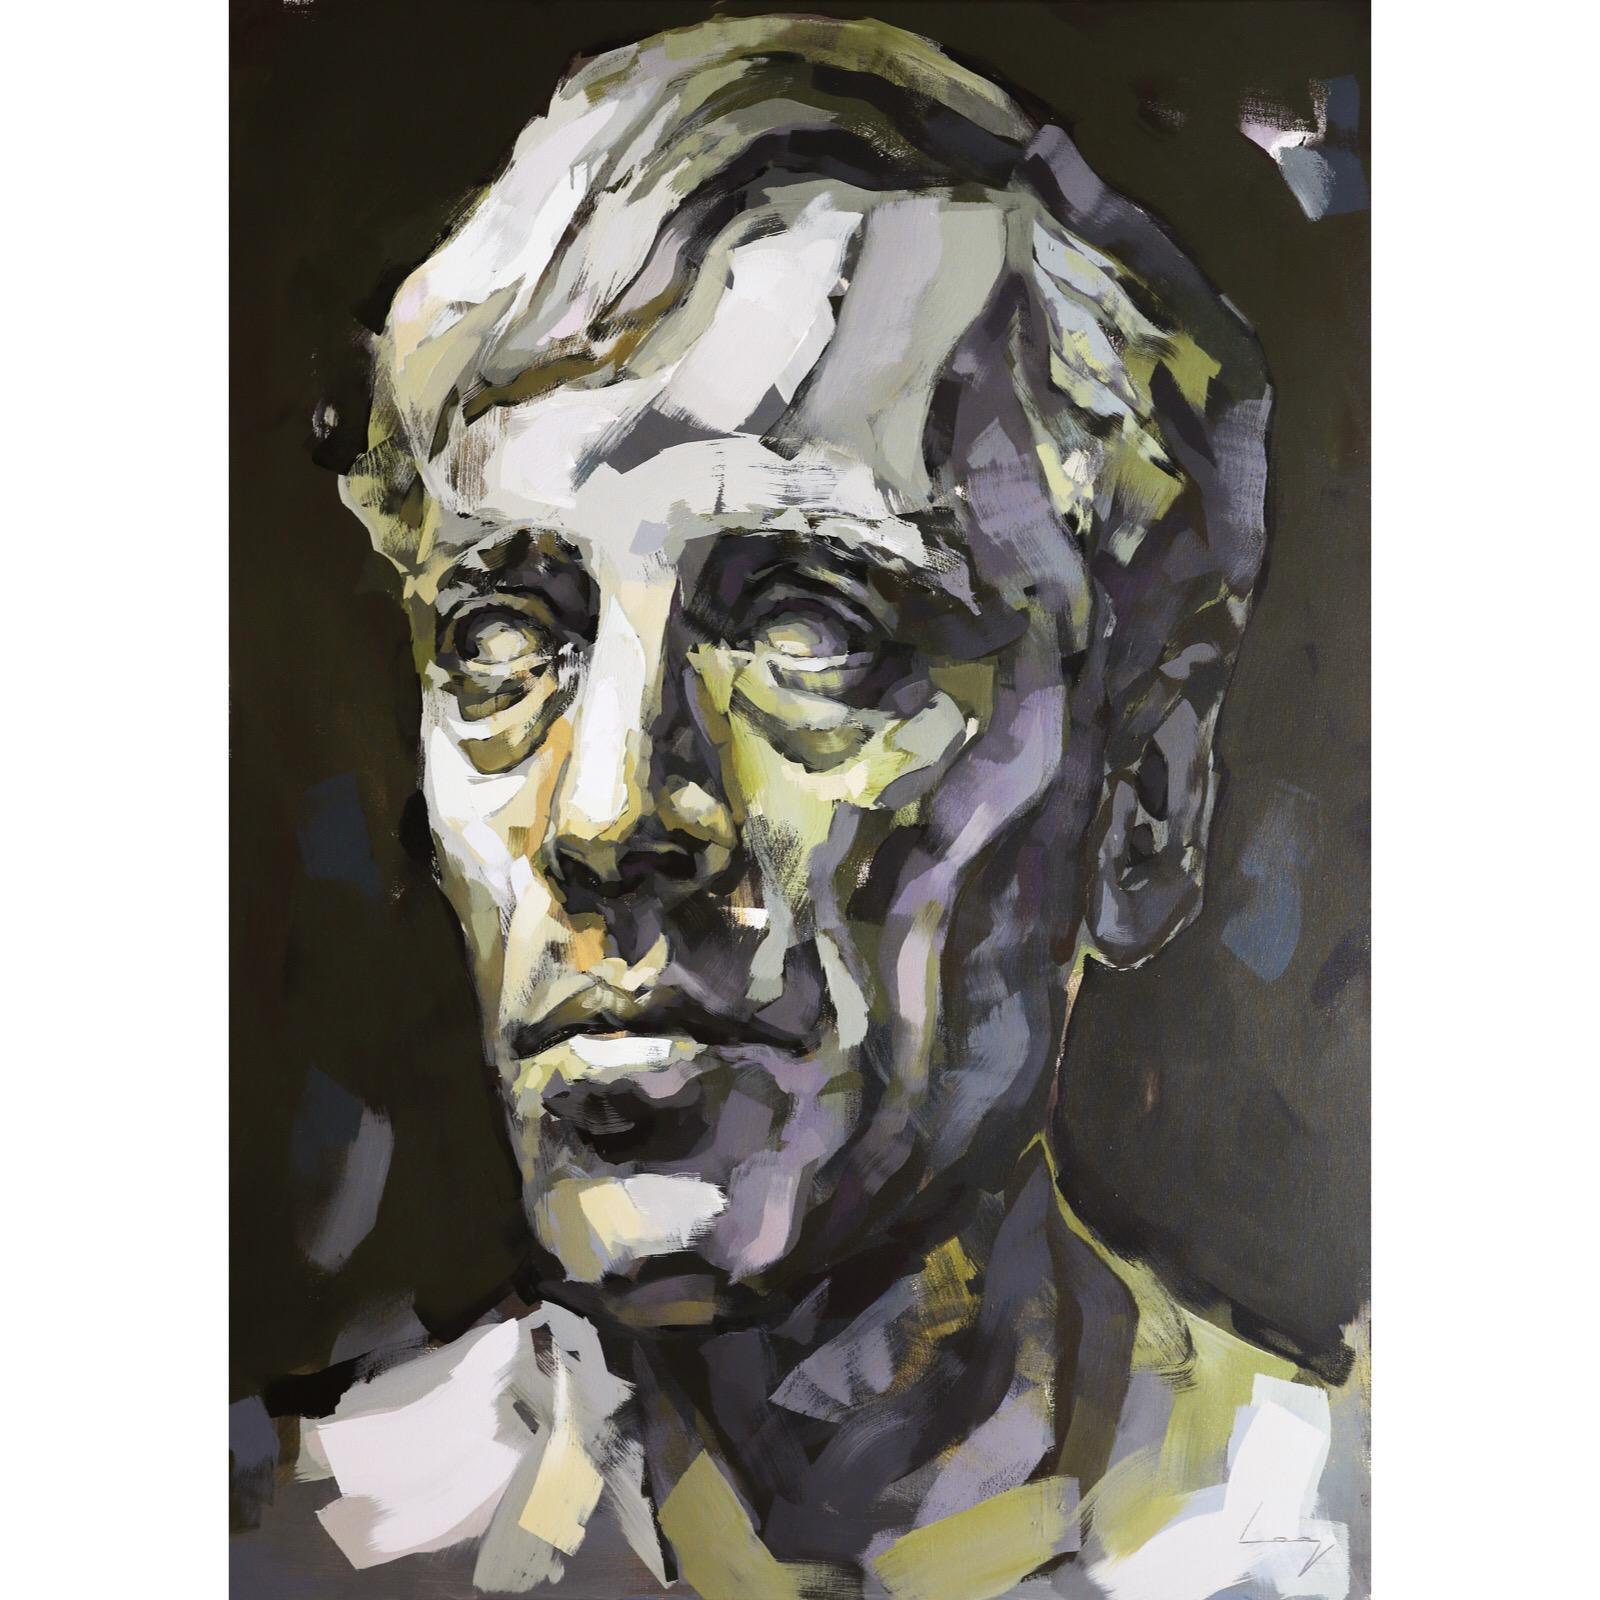 Max Von Sydow 180x130 cm by Alberto Ramirez LEG (Bergman)